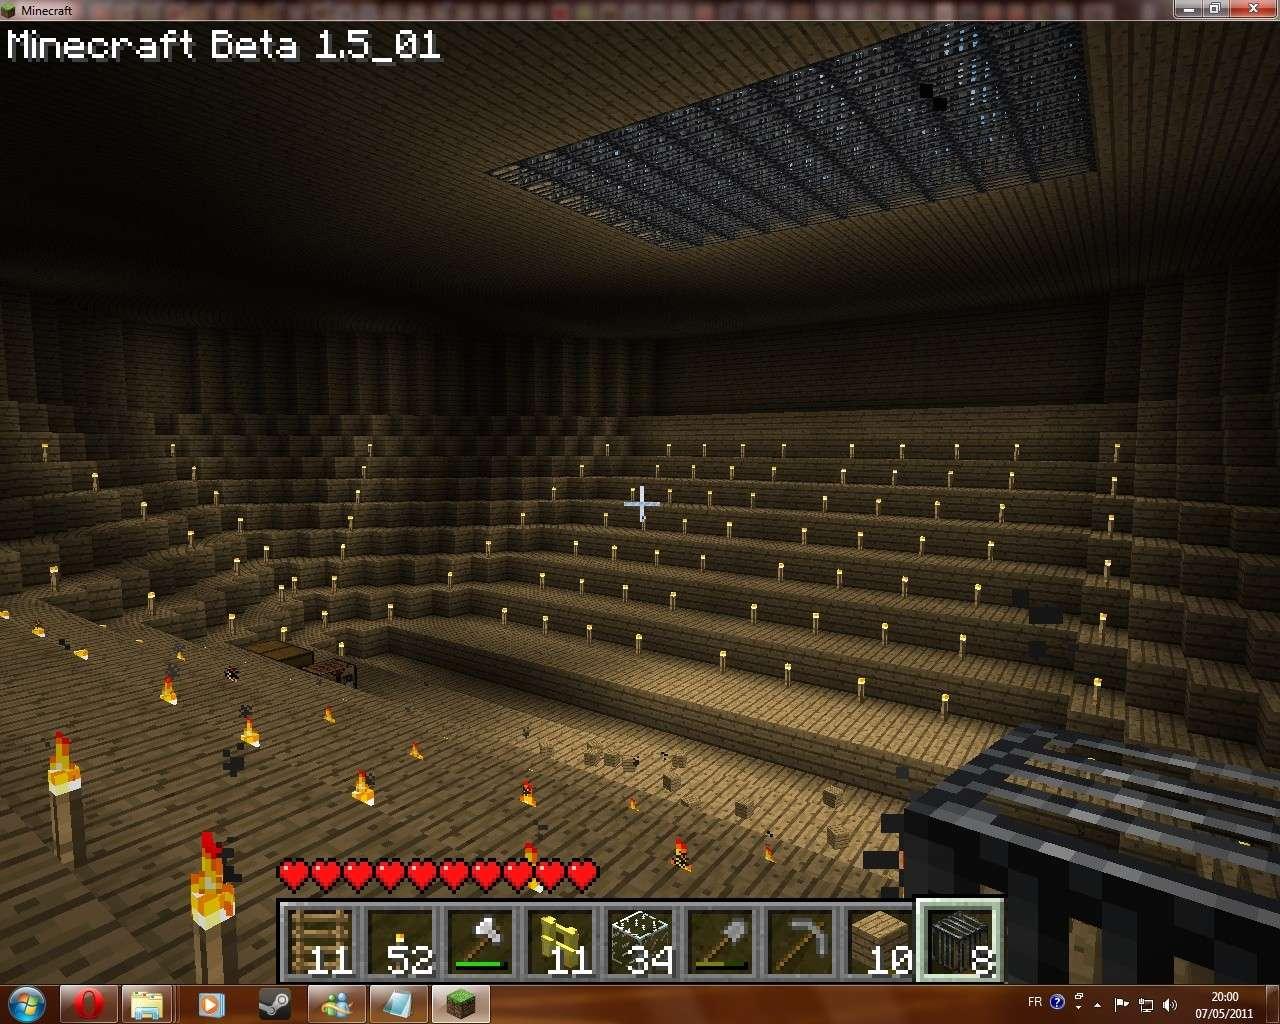 [Minecraft] Mon chez moi (moi moi chez moi moi moiiiii) - Page 5 New_bi15